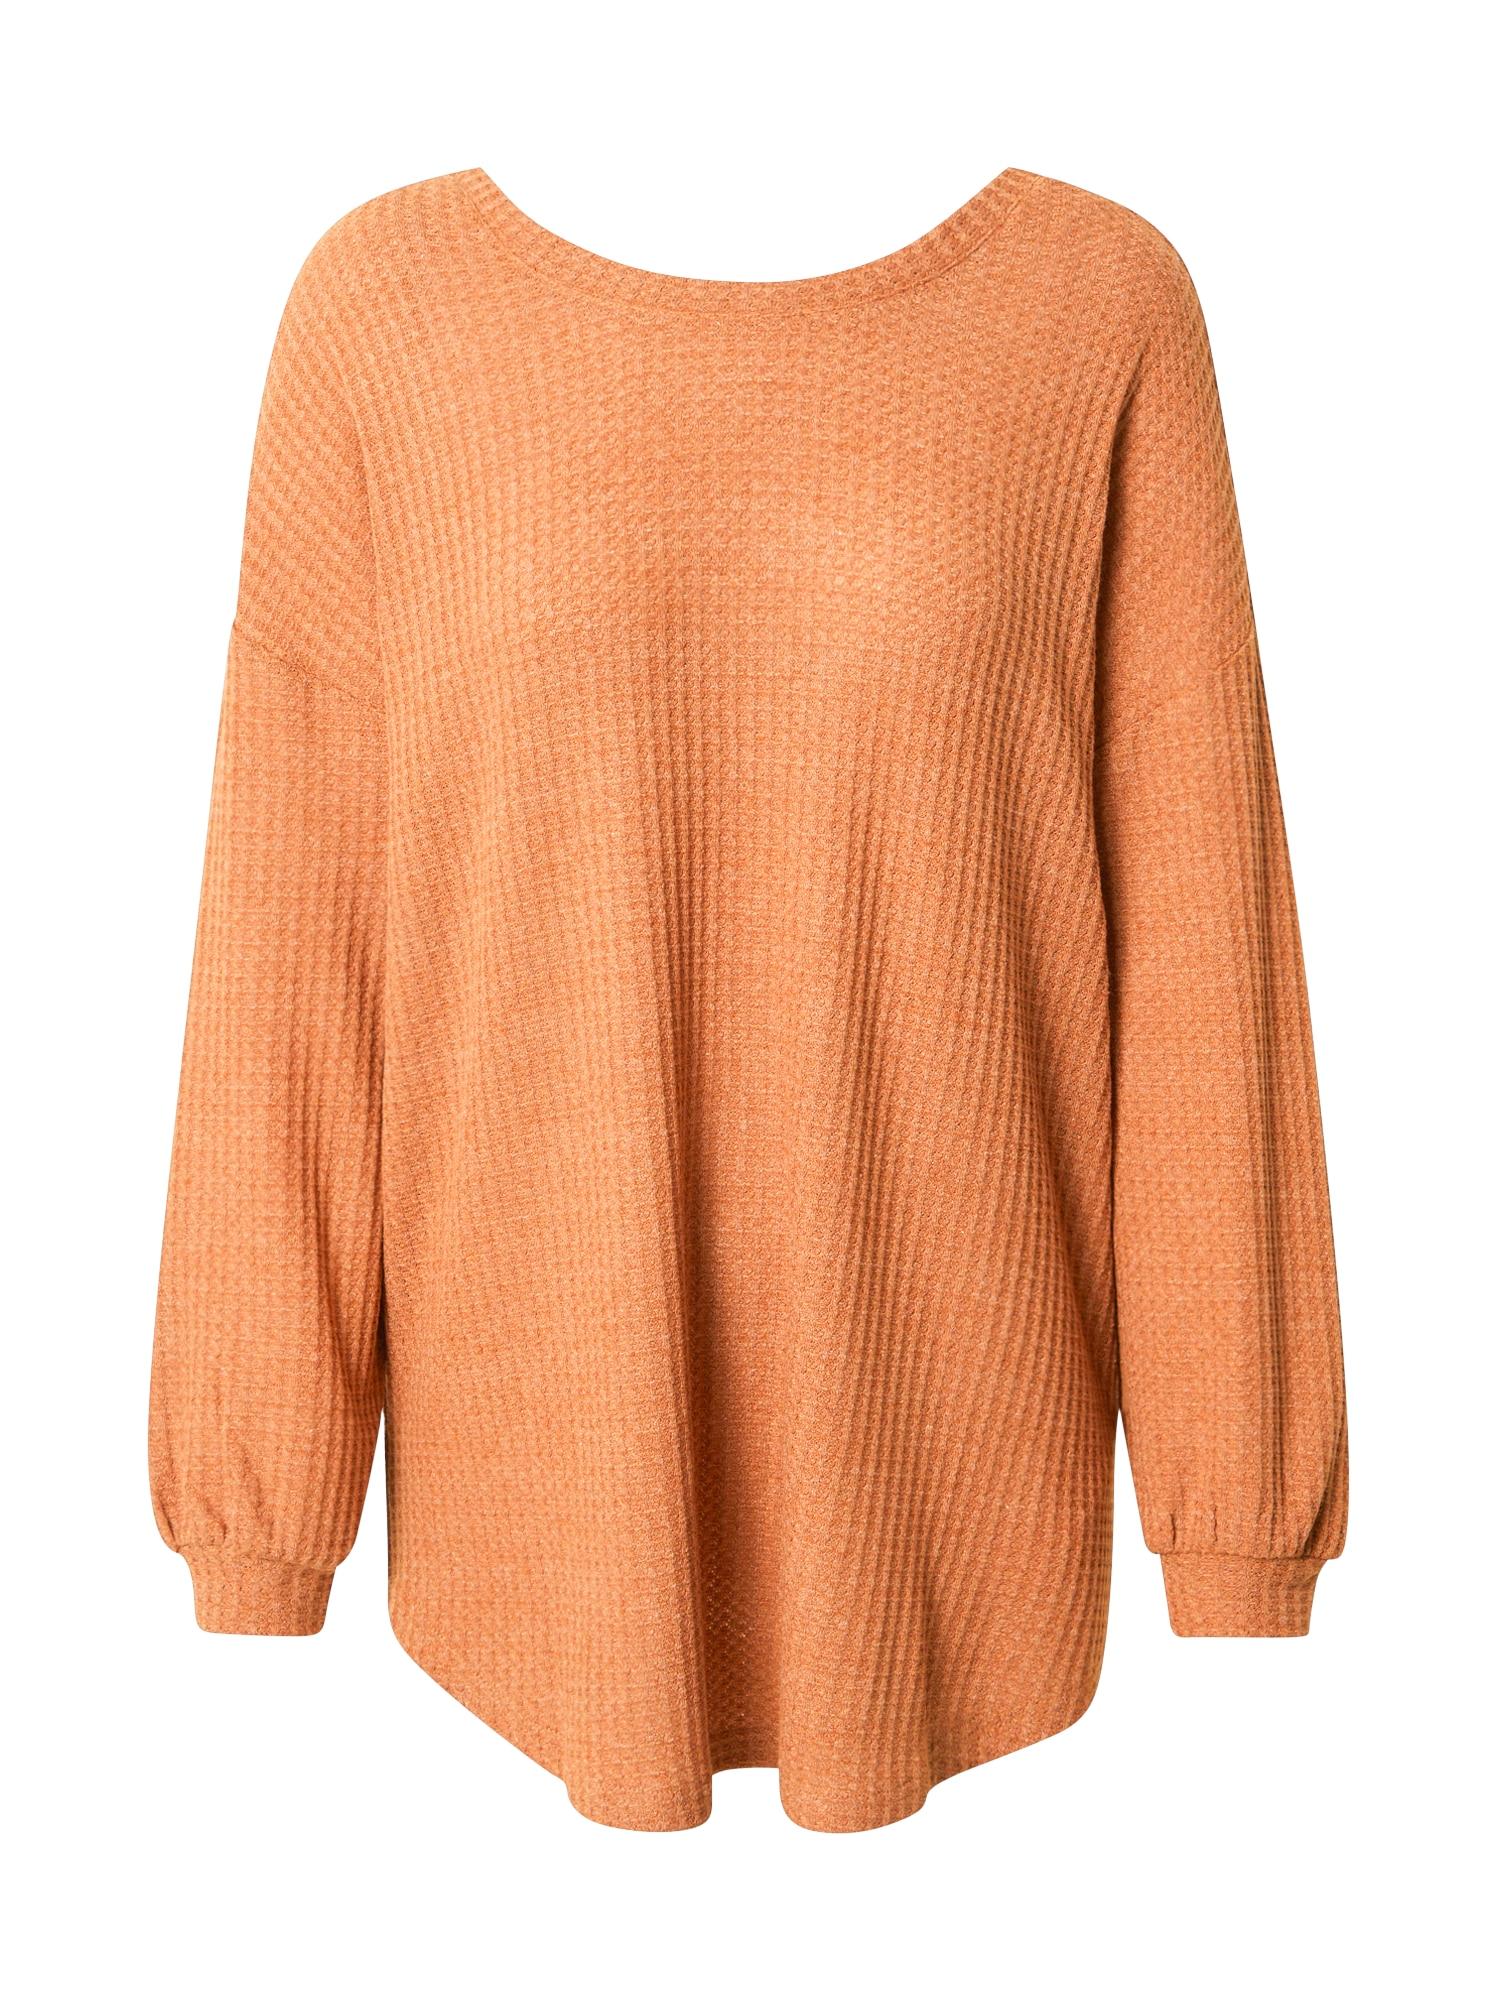 MINKPINK Marškinėliai ruda (konjako)